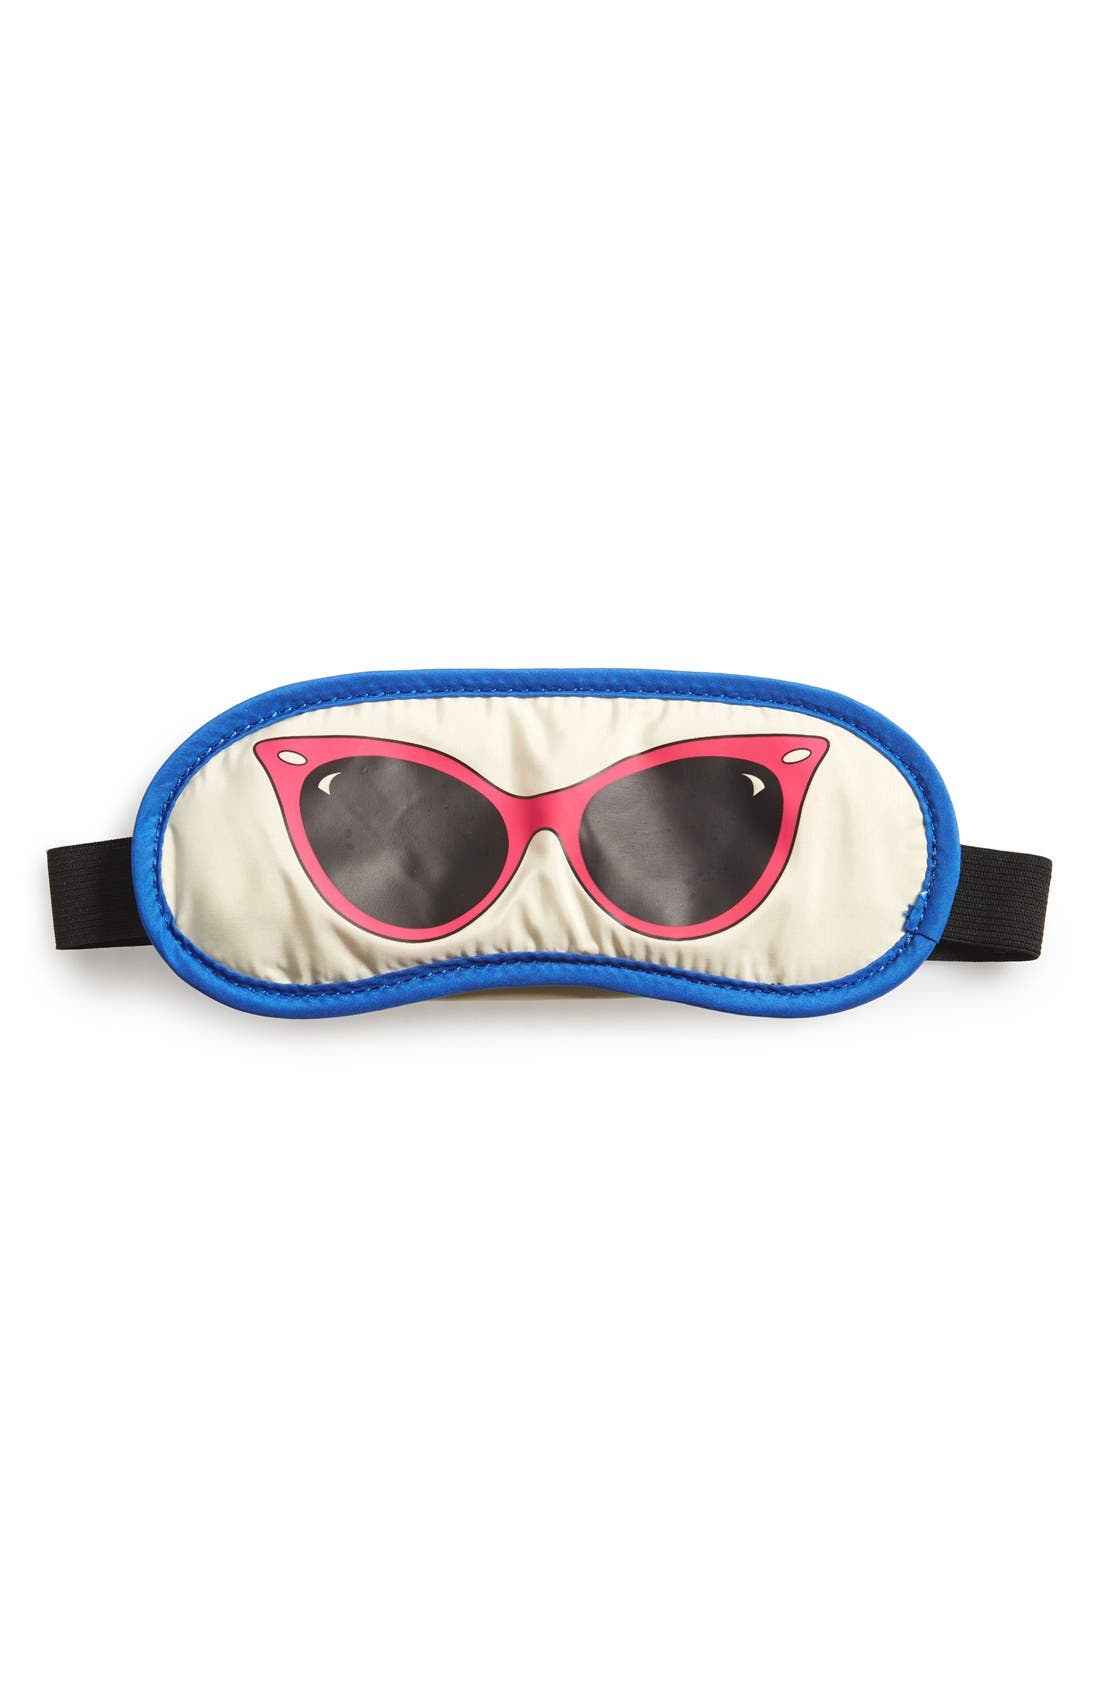 Main Image - FLIGHT 001 'Cat Eye Sunglasses' Sleep Mask